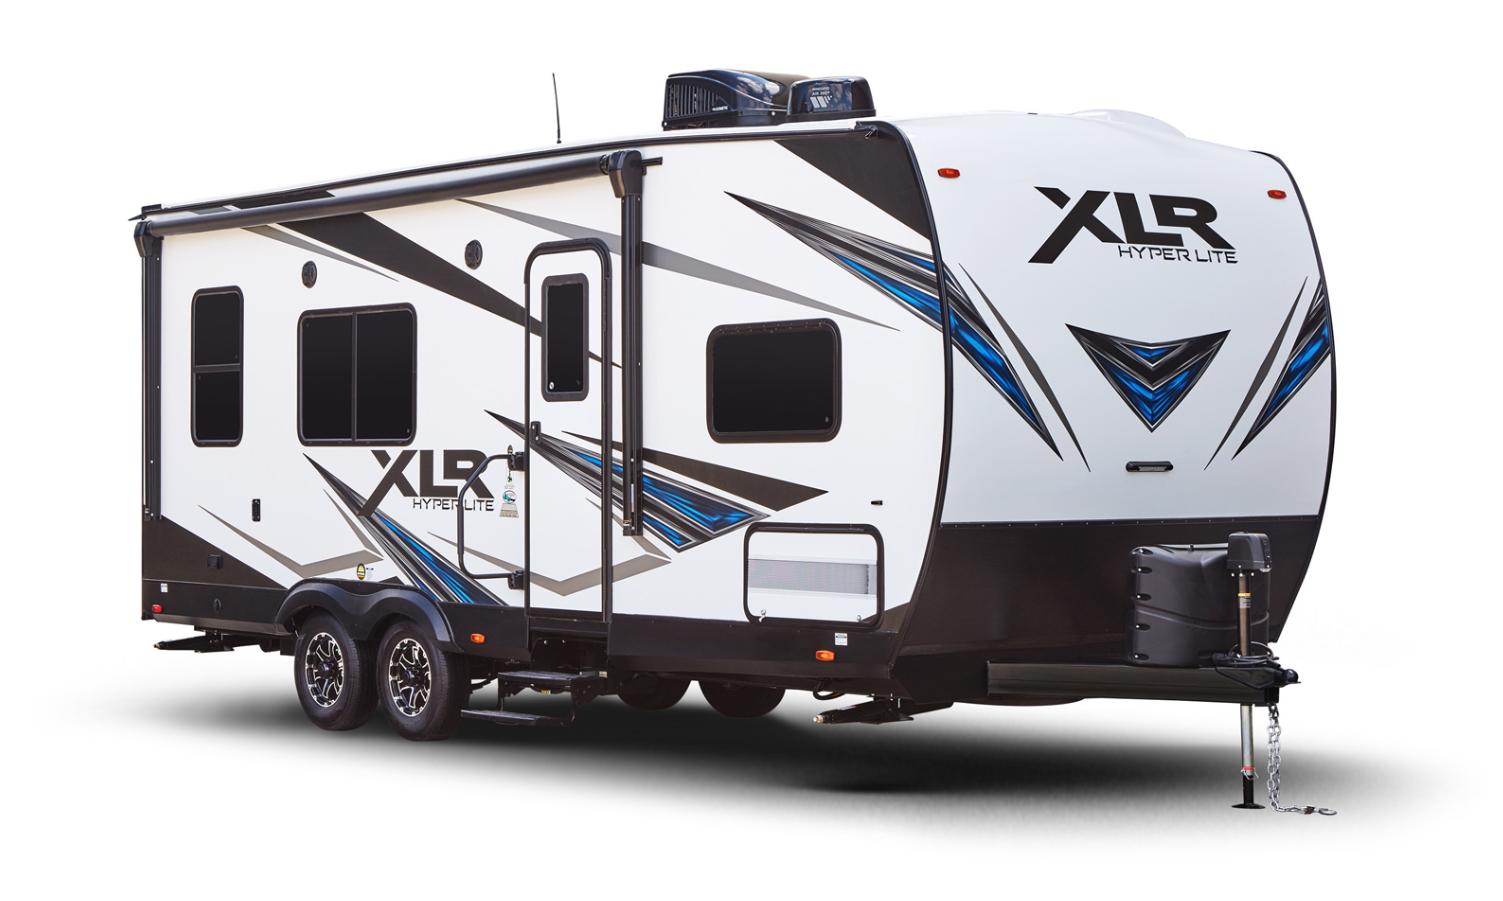 forest river xlr hyperlite toy hauler travel trailer exterior